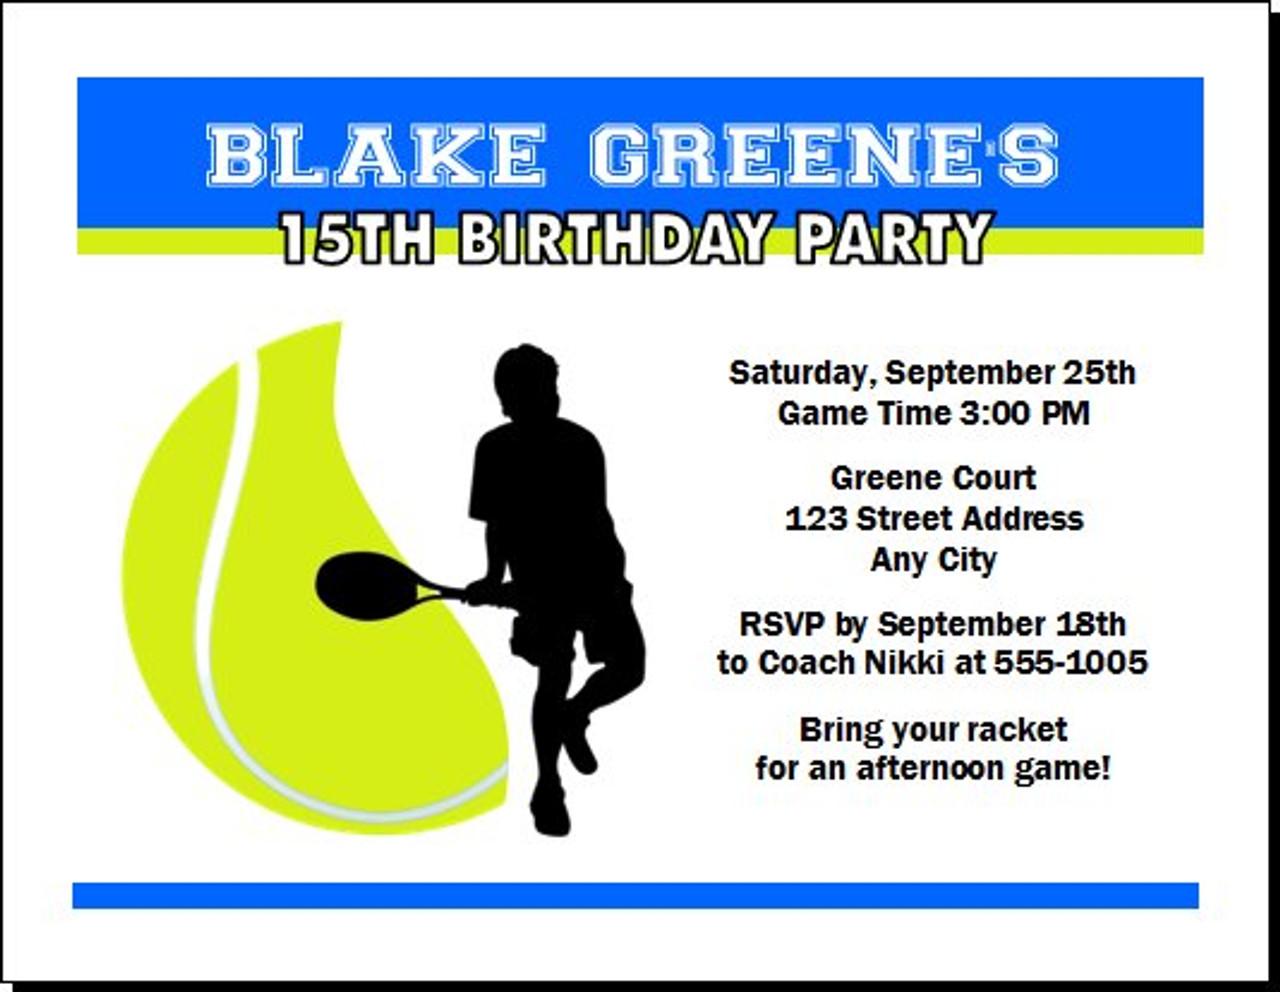 Tennis birthday party invitation set of 12 tennis birthday party invitation filmwisefo